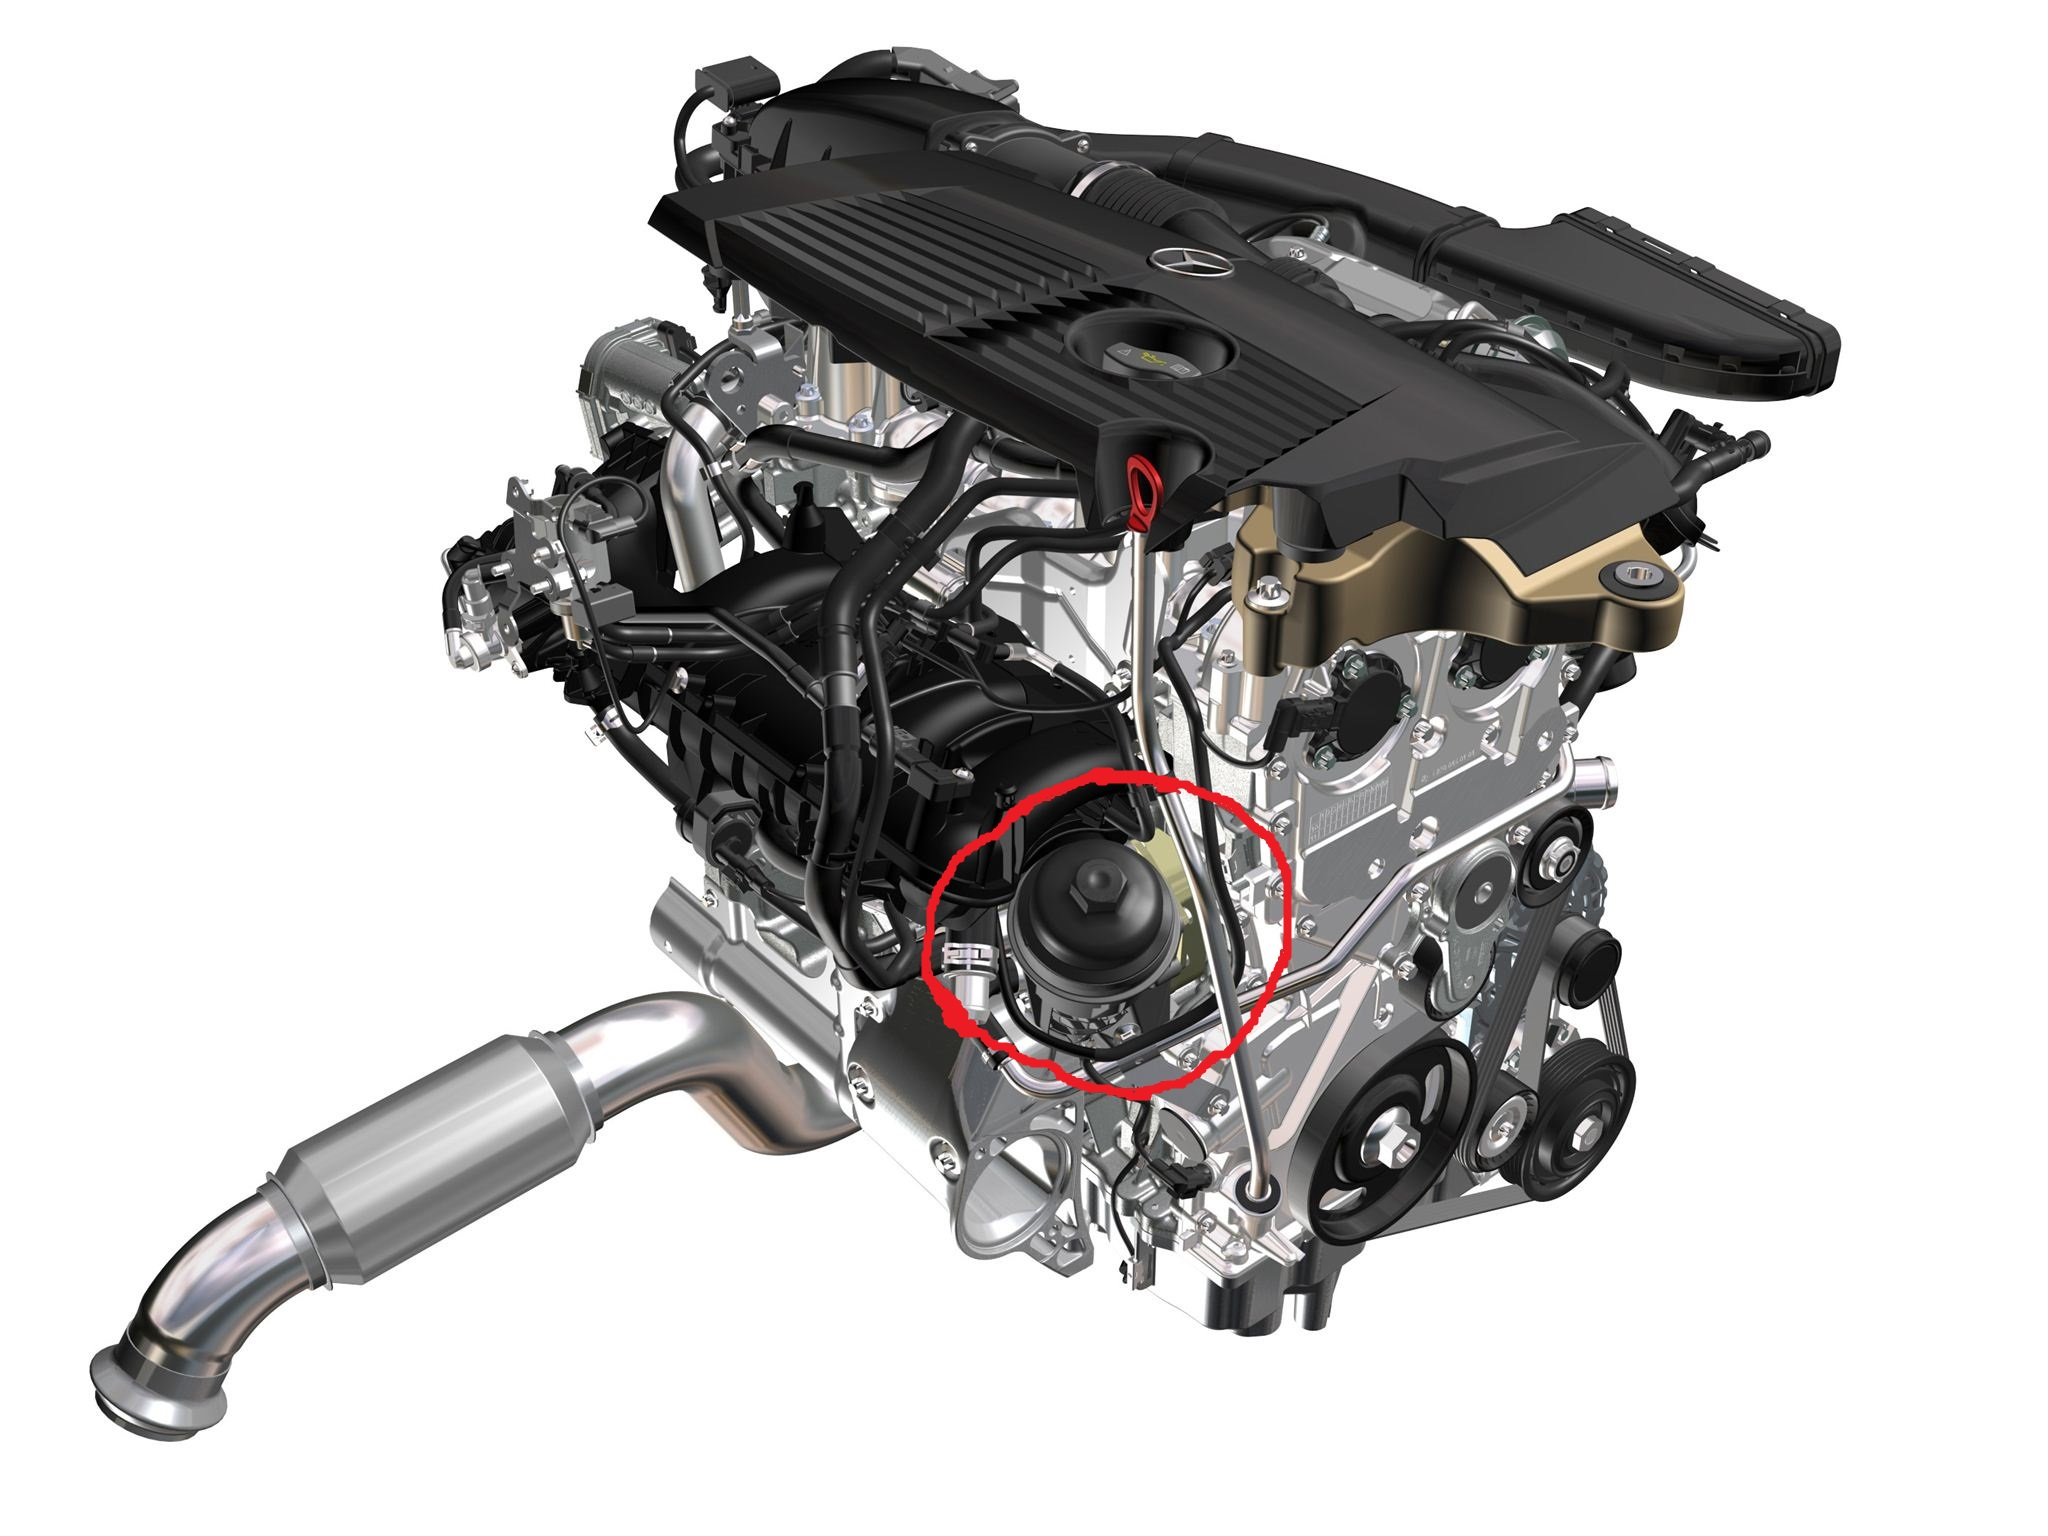 D Cla Oil Filter Location M on 3 4l Engine Diagram